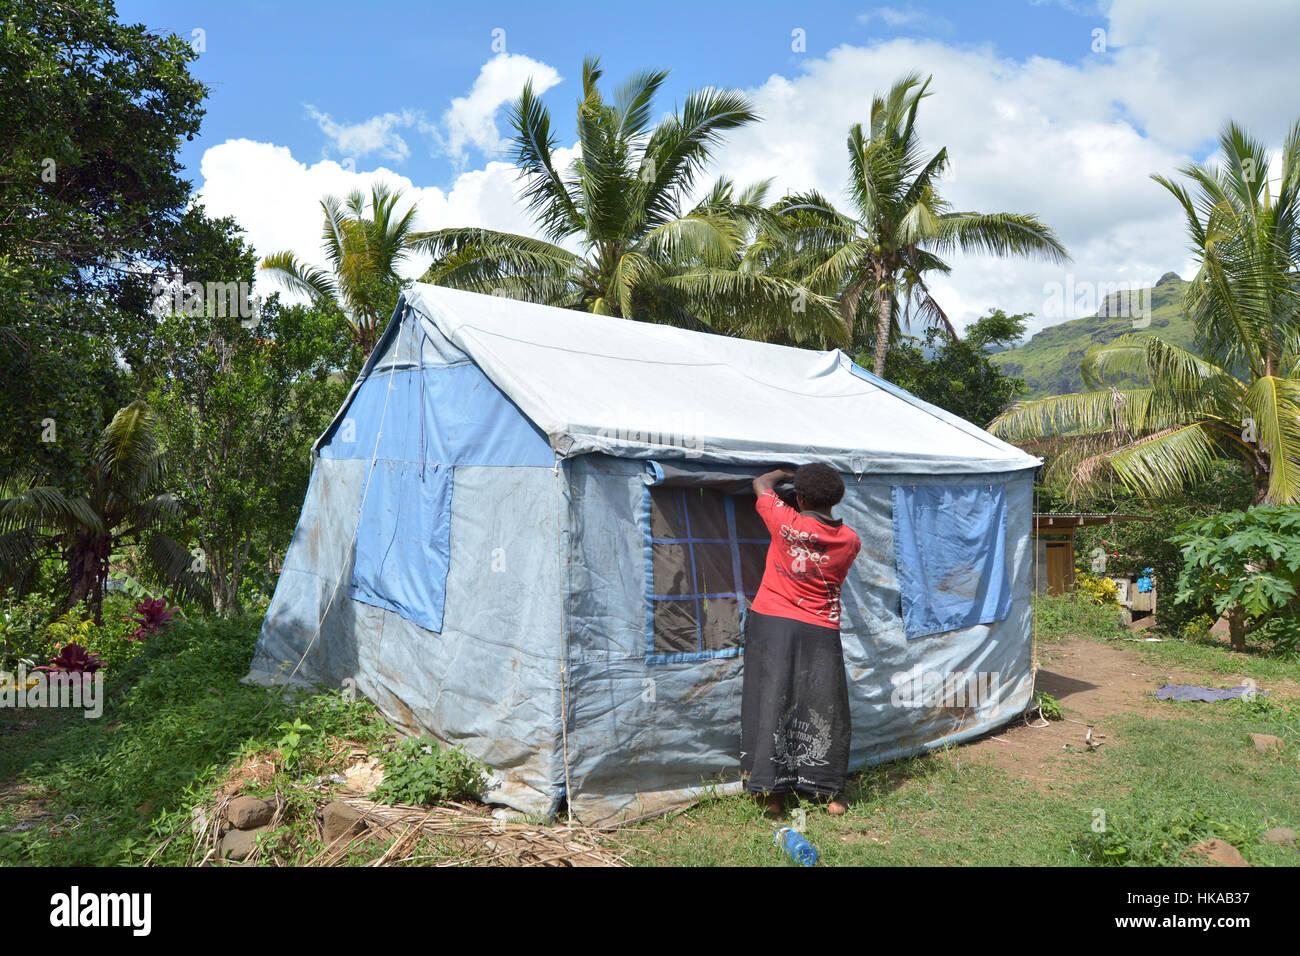 BA FIJI - DEC 30 2016Victim of Cyclone Winston live in UNICEF tent in Navala village. Fiji struggles to rebuild a year after Cyclone Winston tropic & BA FIJI - DEC 30 2016:Victim of Cyclone Winston live in UNICEF ...